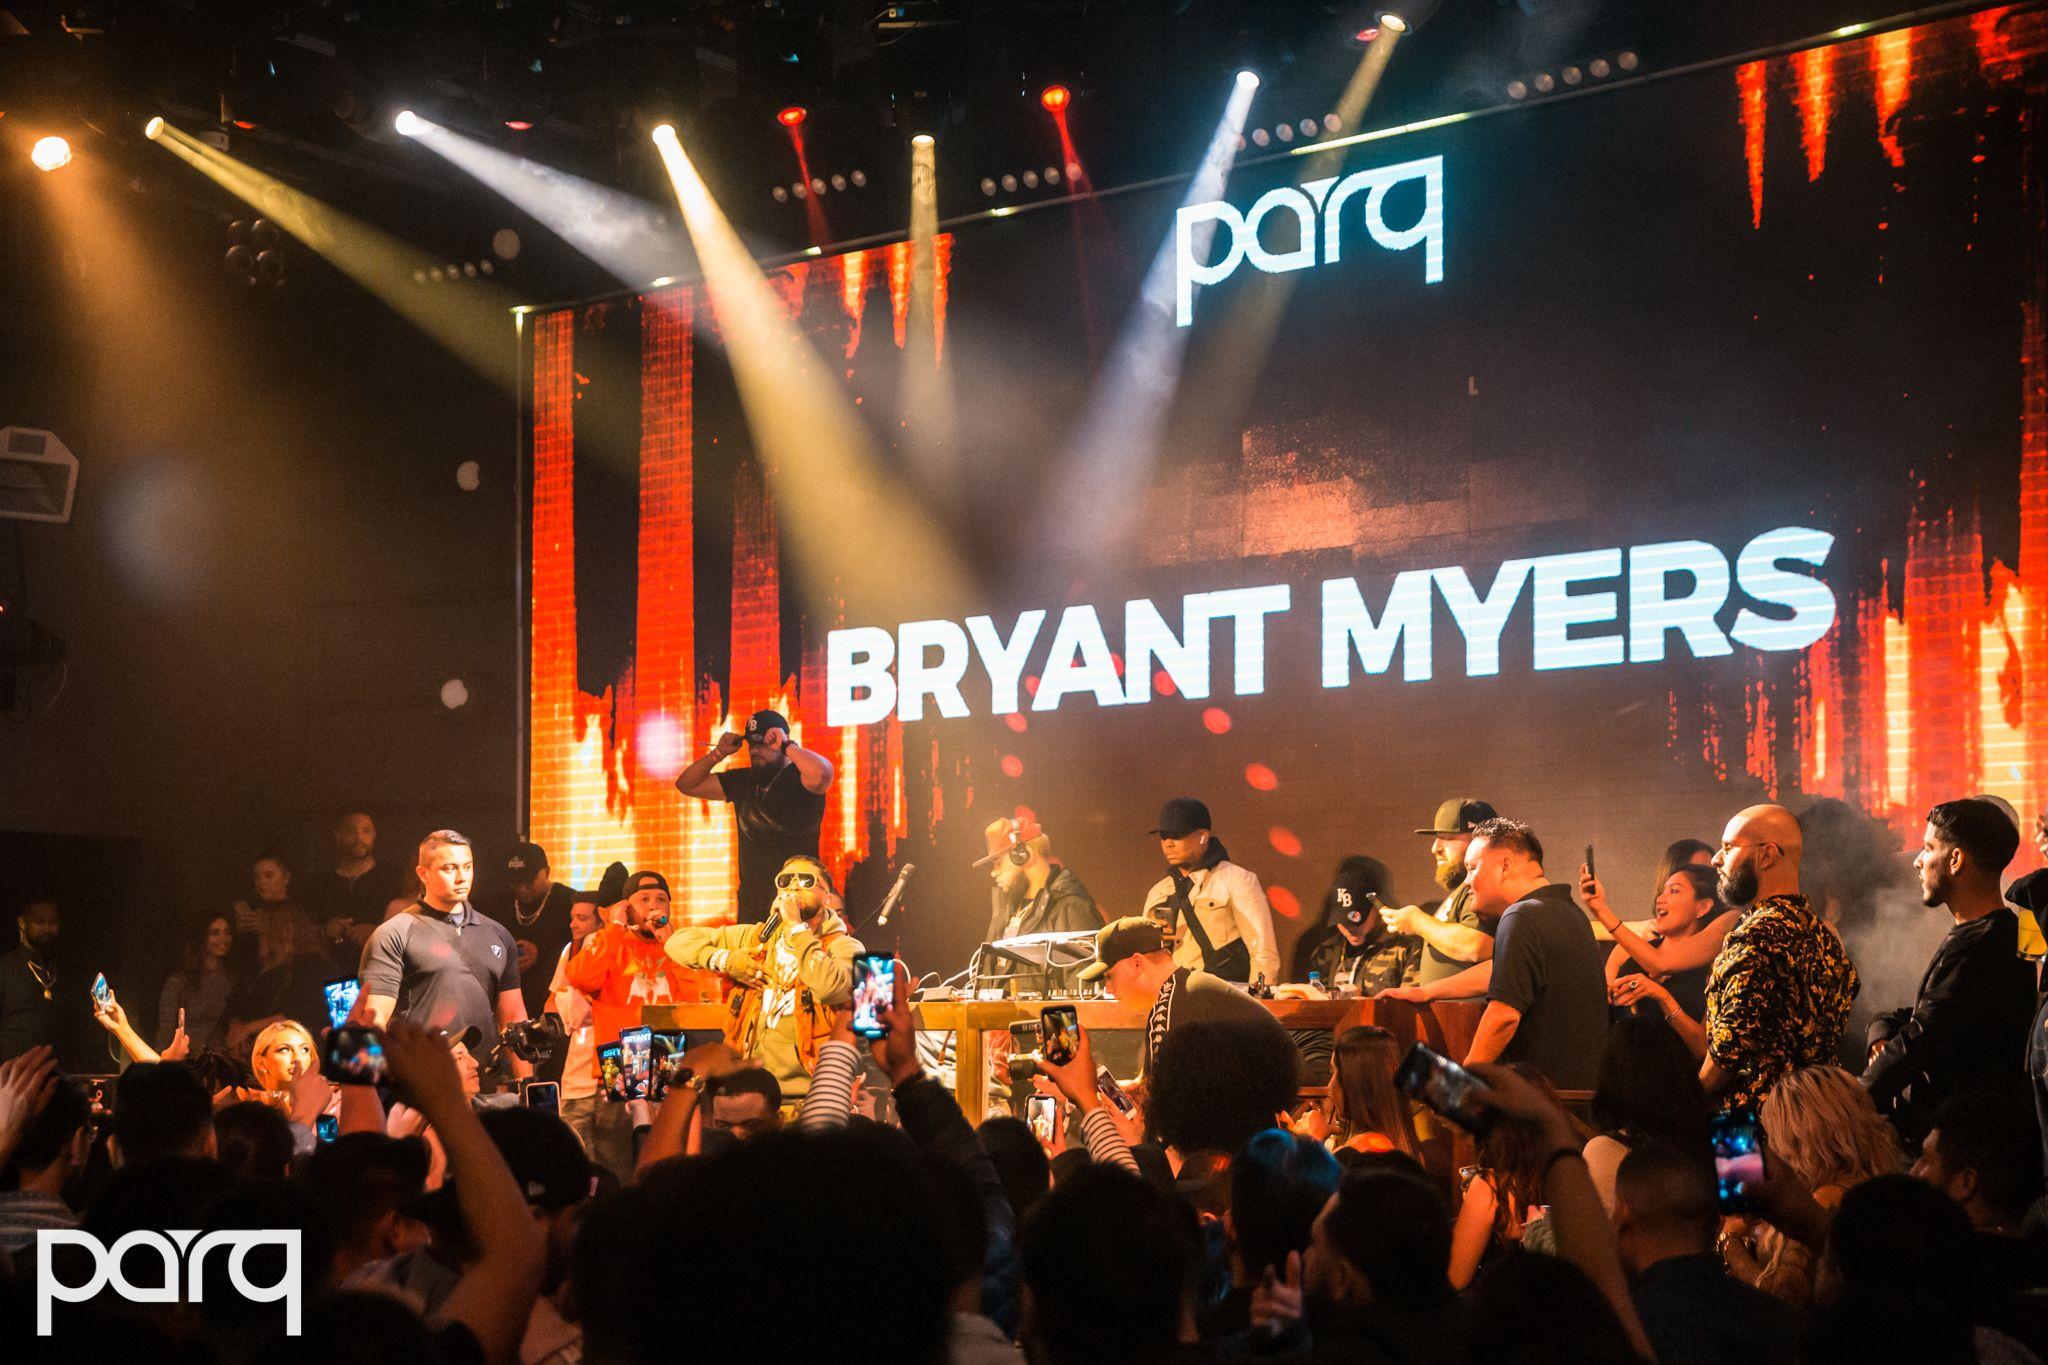 12.13.19 Parq - Bryant Myers-31.jpg